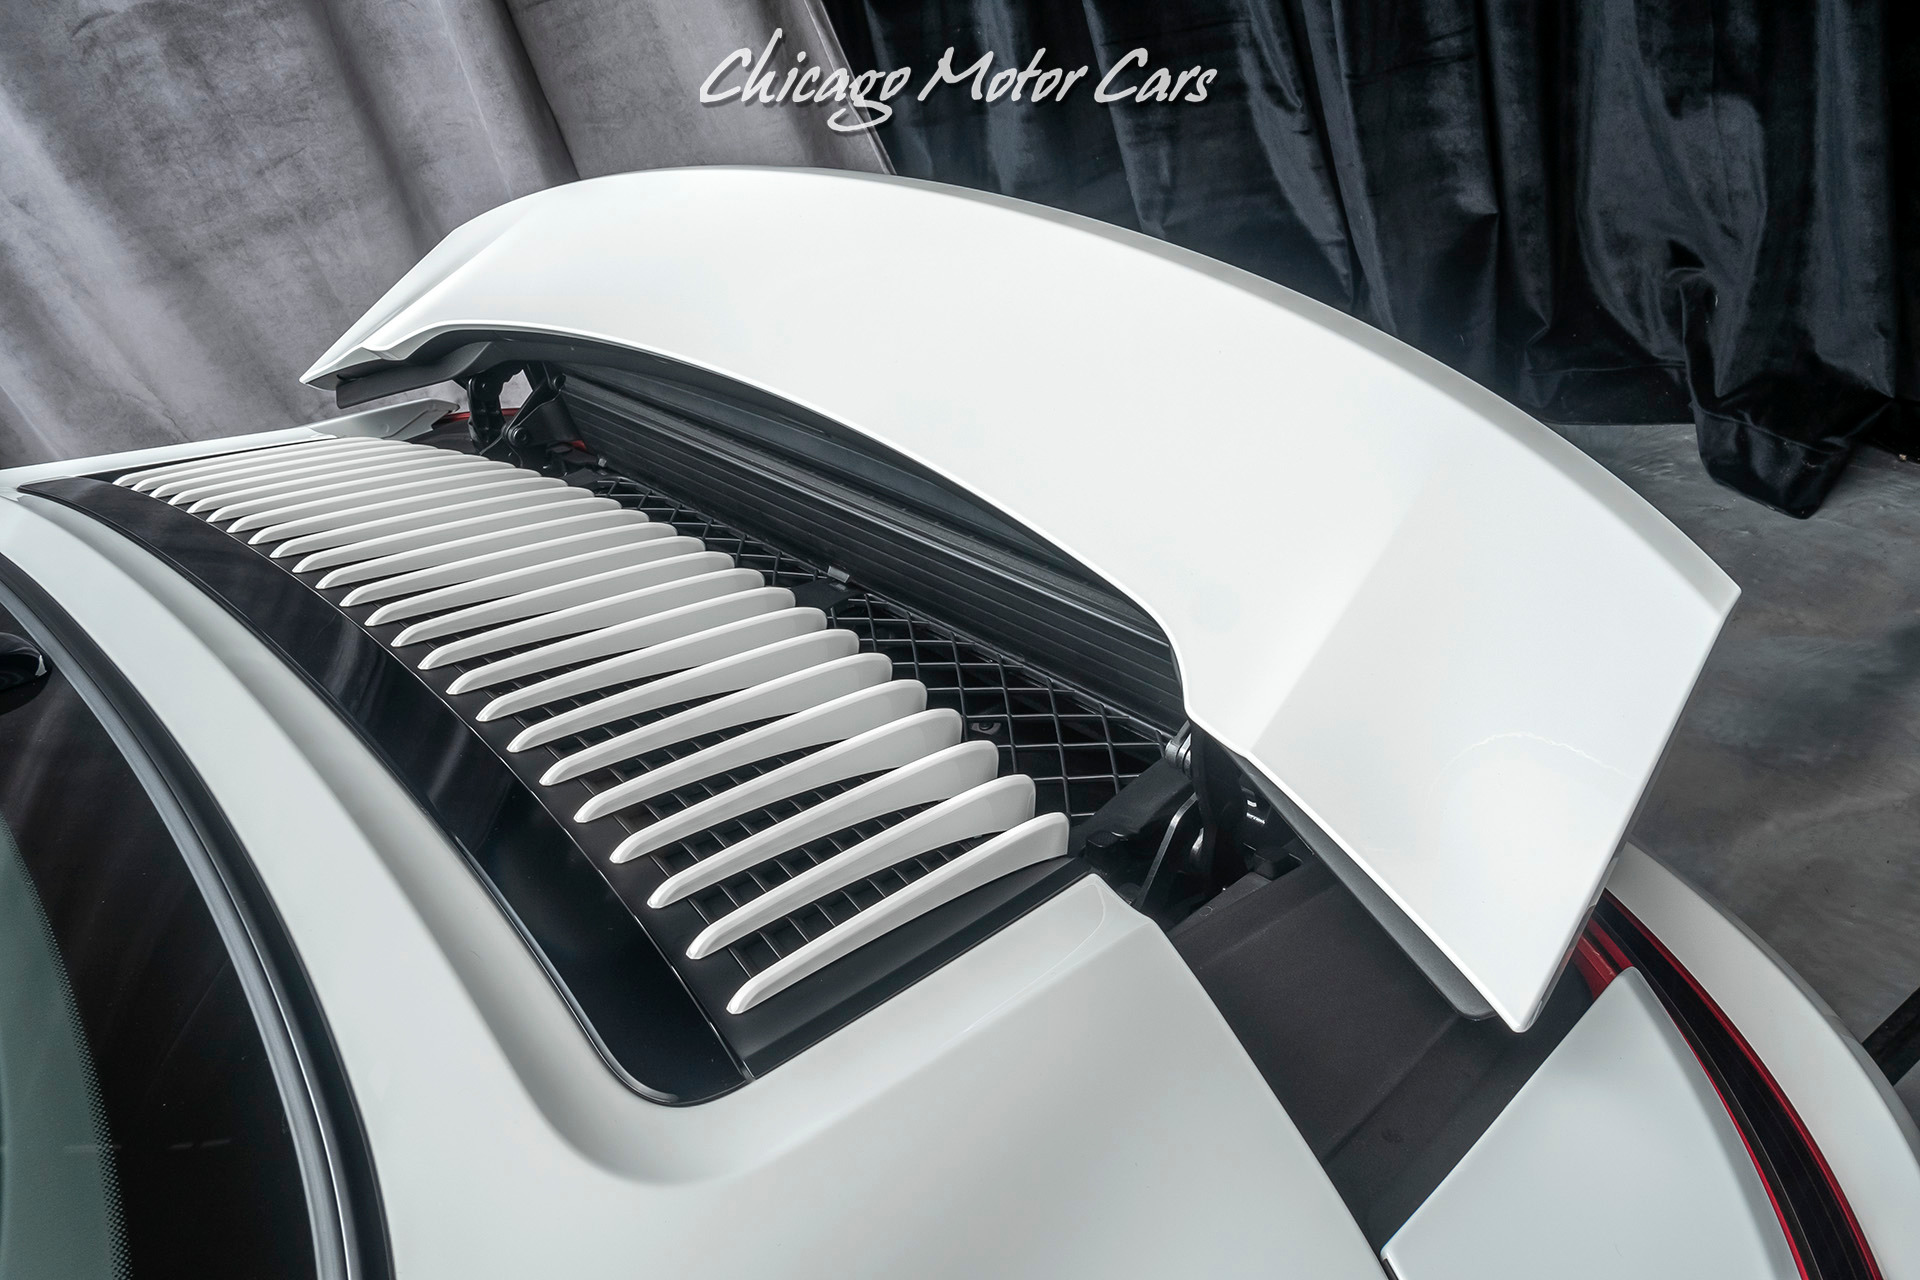 Used-2018-Porsche-911-Targa-4-GTS-Convertible-Only-1600-Miles-Manual-Trans-Original-MSRP-166k